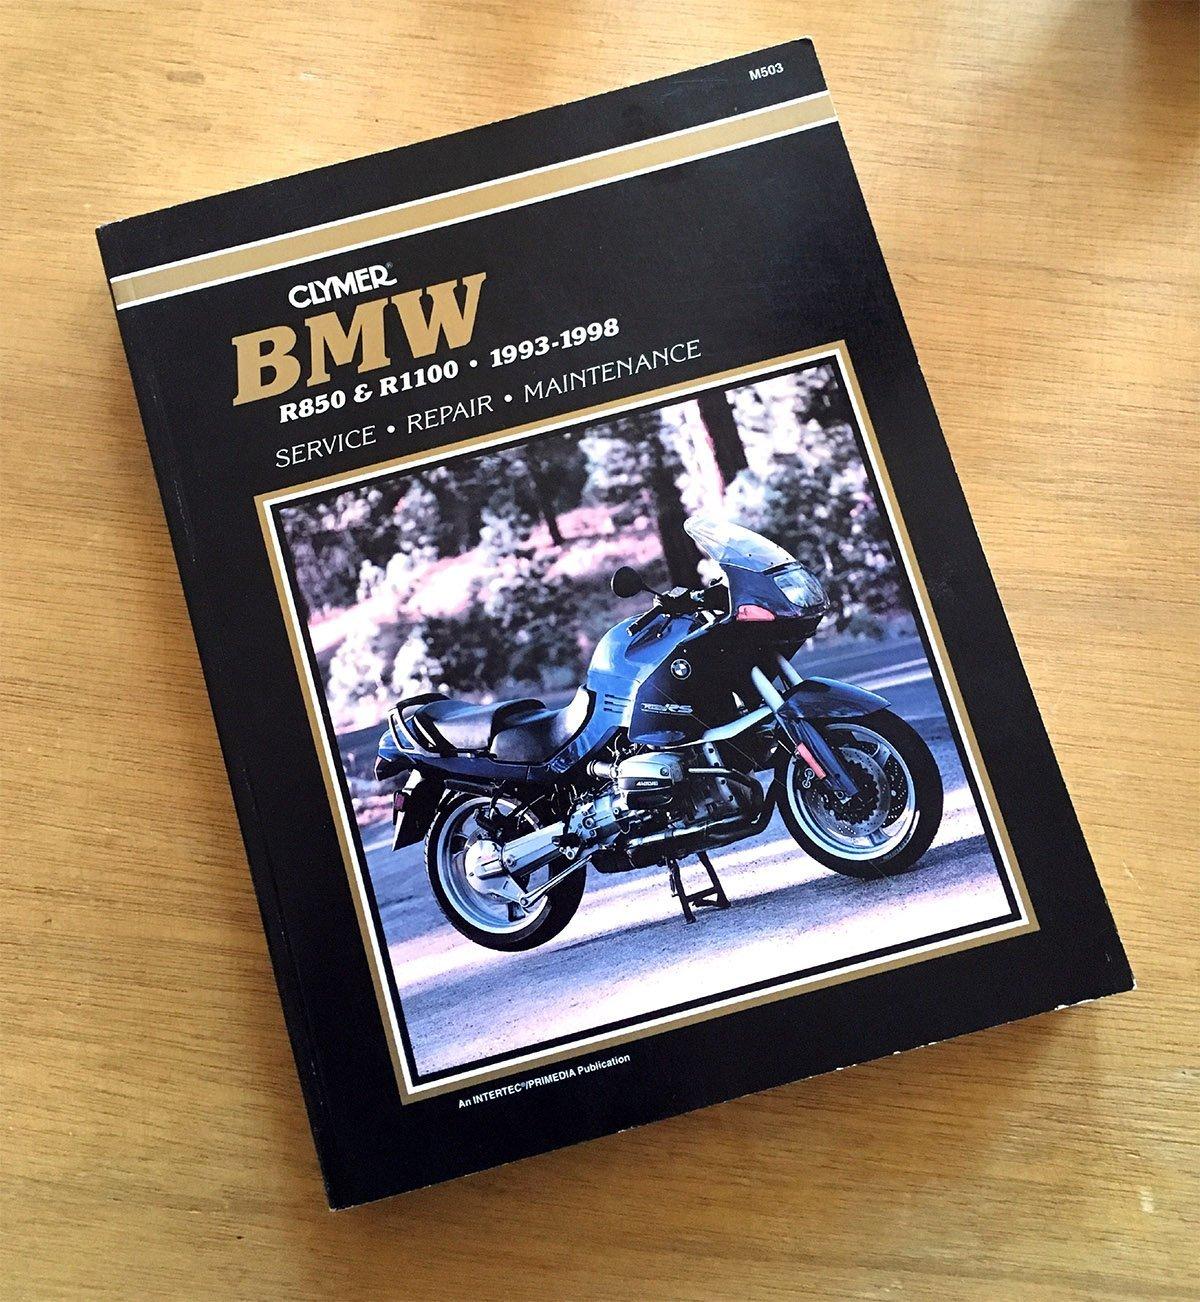 Clymer BMW R850 & R1100, 1993-1998: Service, Repair, Maintenance:  Amazon.co.uk: Anonymous: 9780892877201: Books